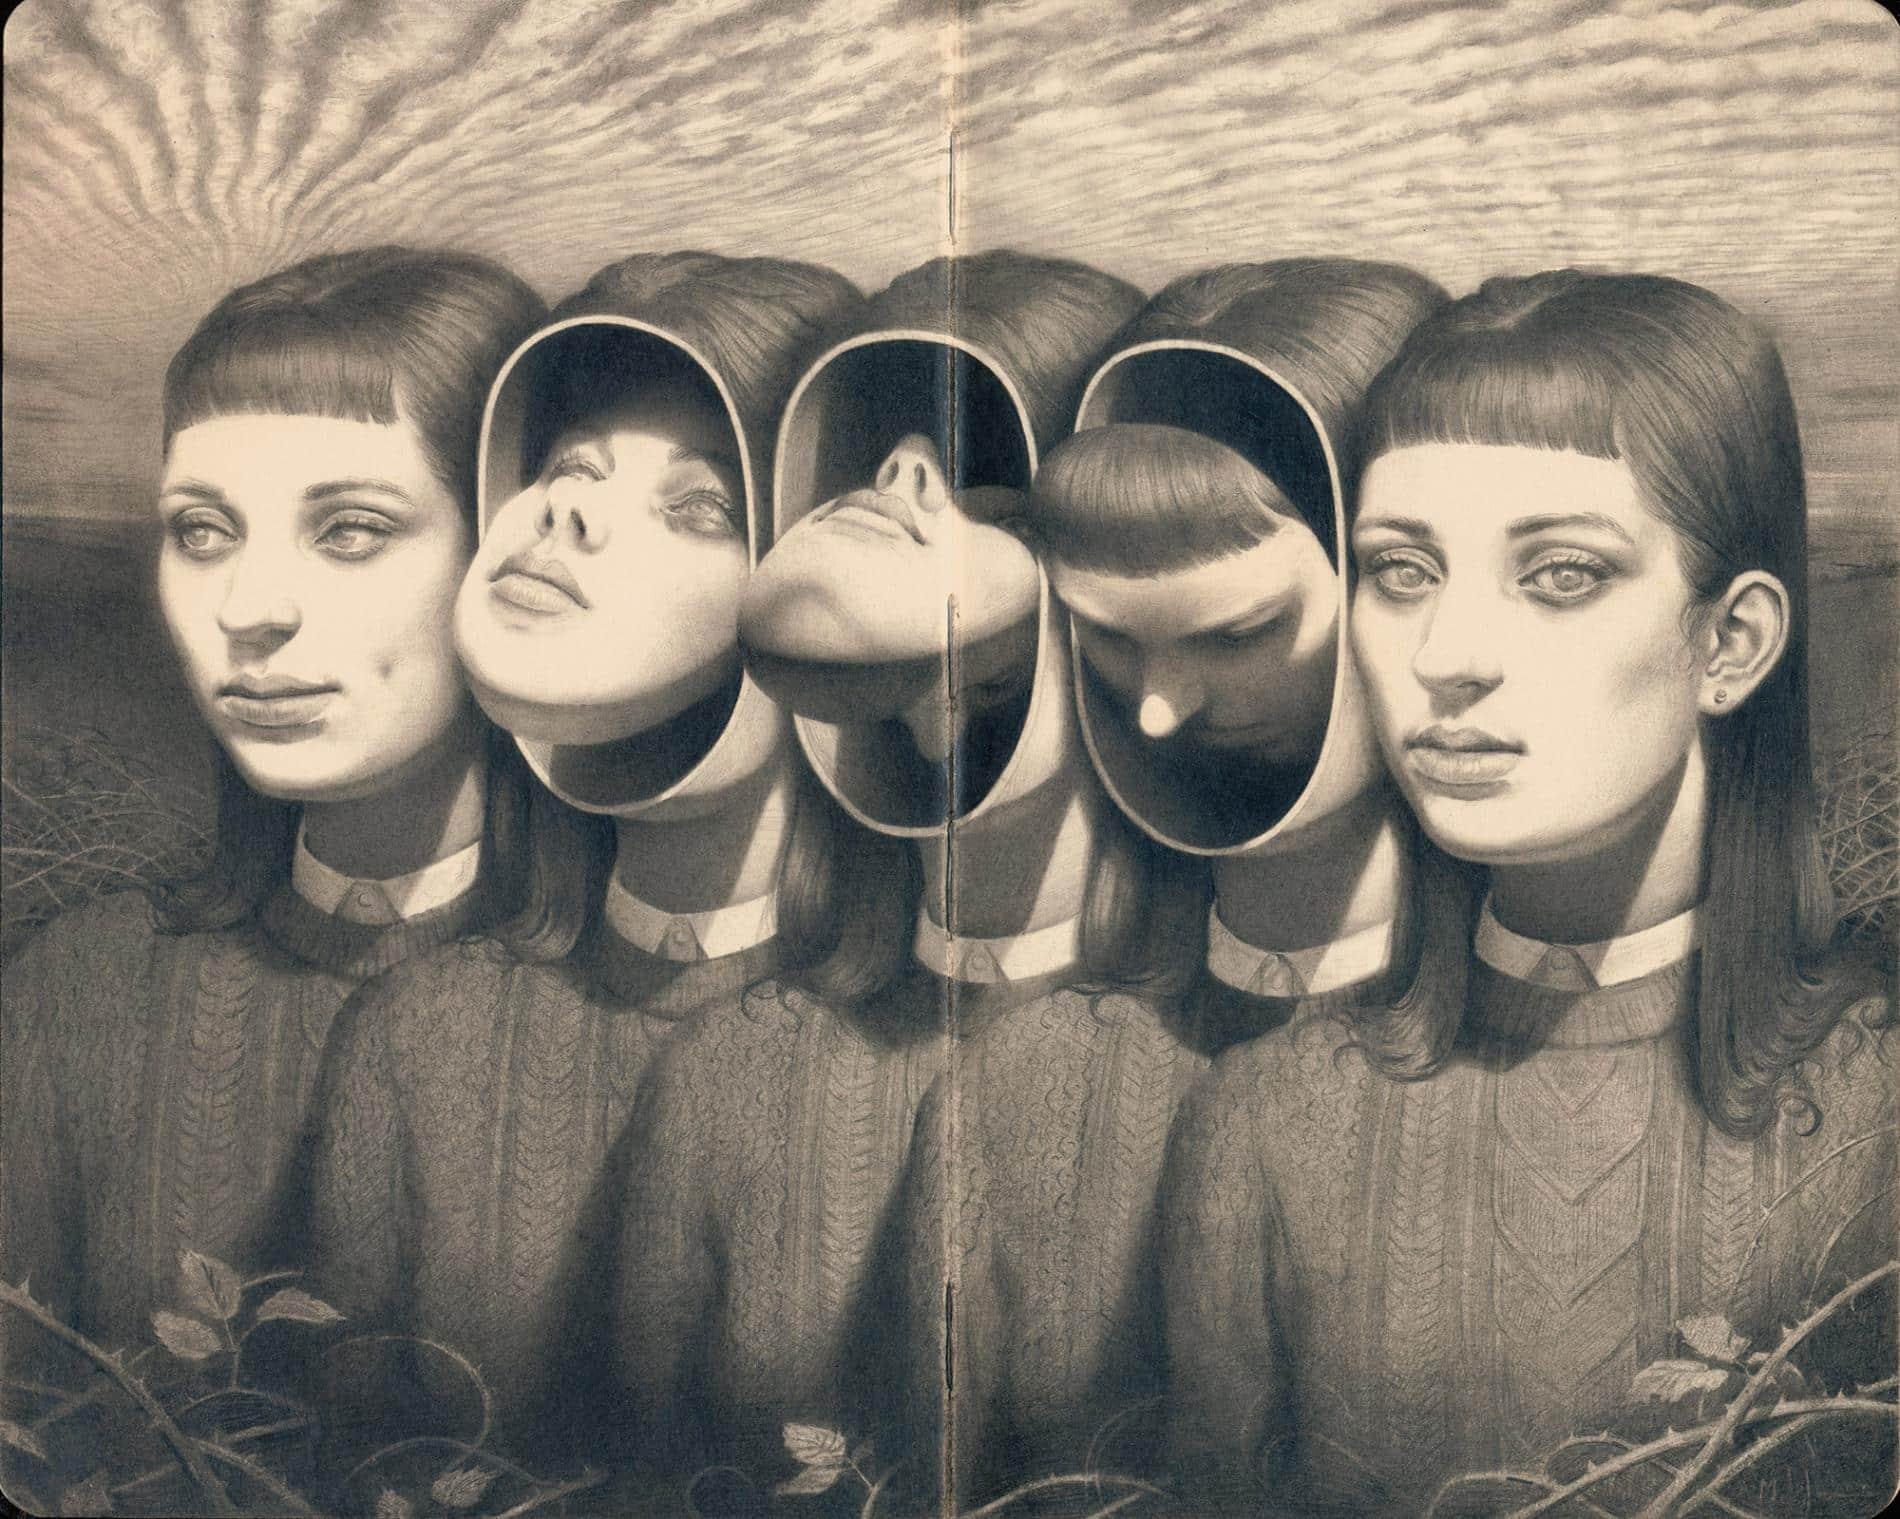 johnston retratos grafito metamorfosis caras